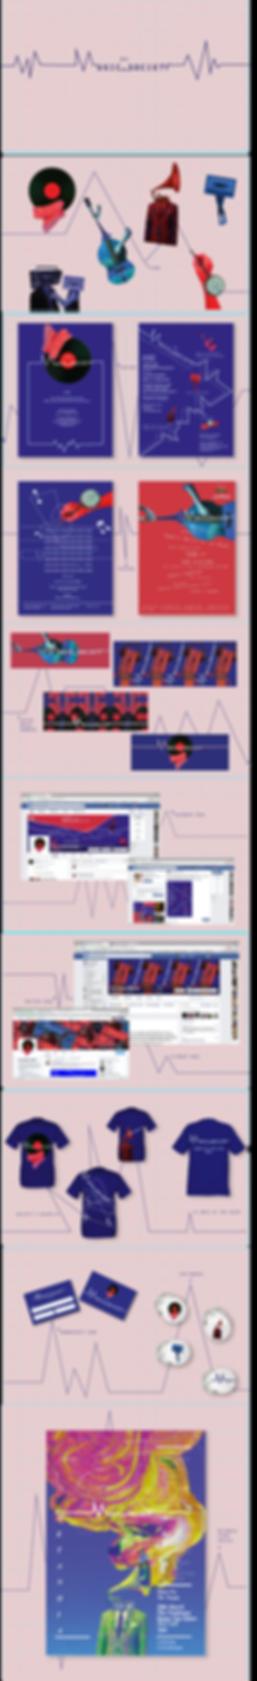 NTU Music society 2015 visual brand identity design presentation by Jasmin Issaka graphic designer